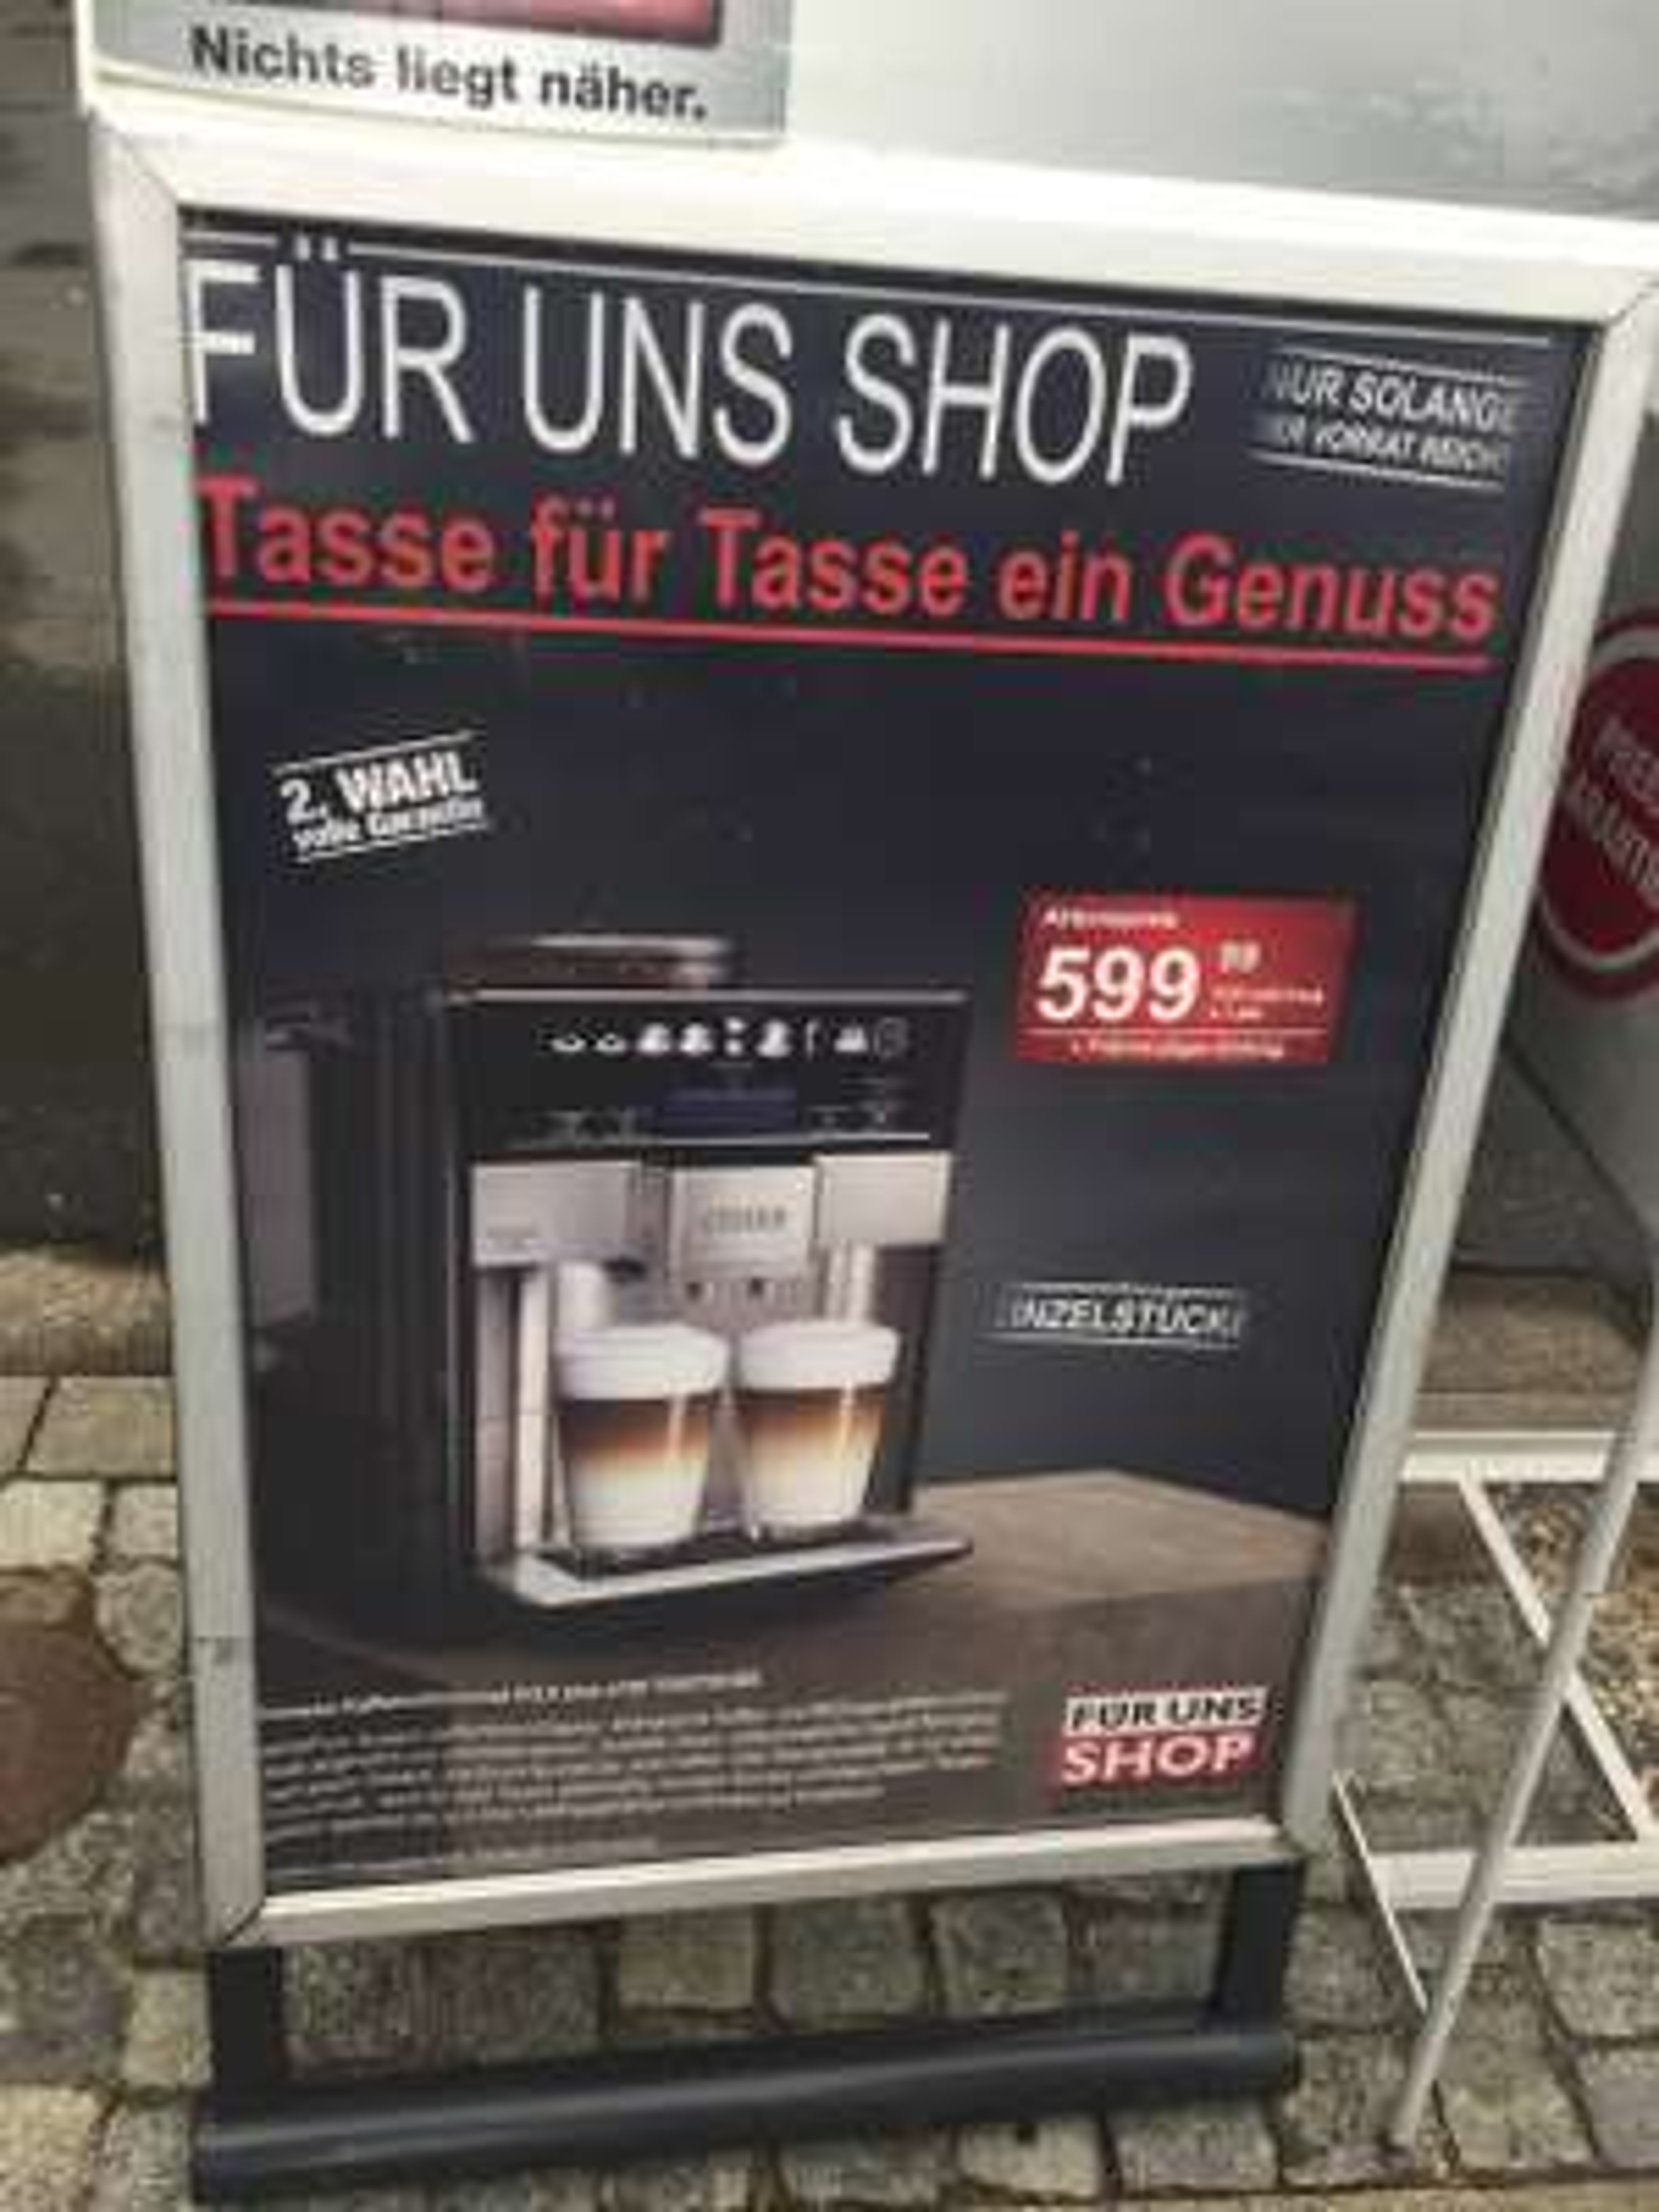 [Erlangen, Für uns Shop]: Siemens EQ.6 plus s700 TE657503DE